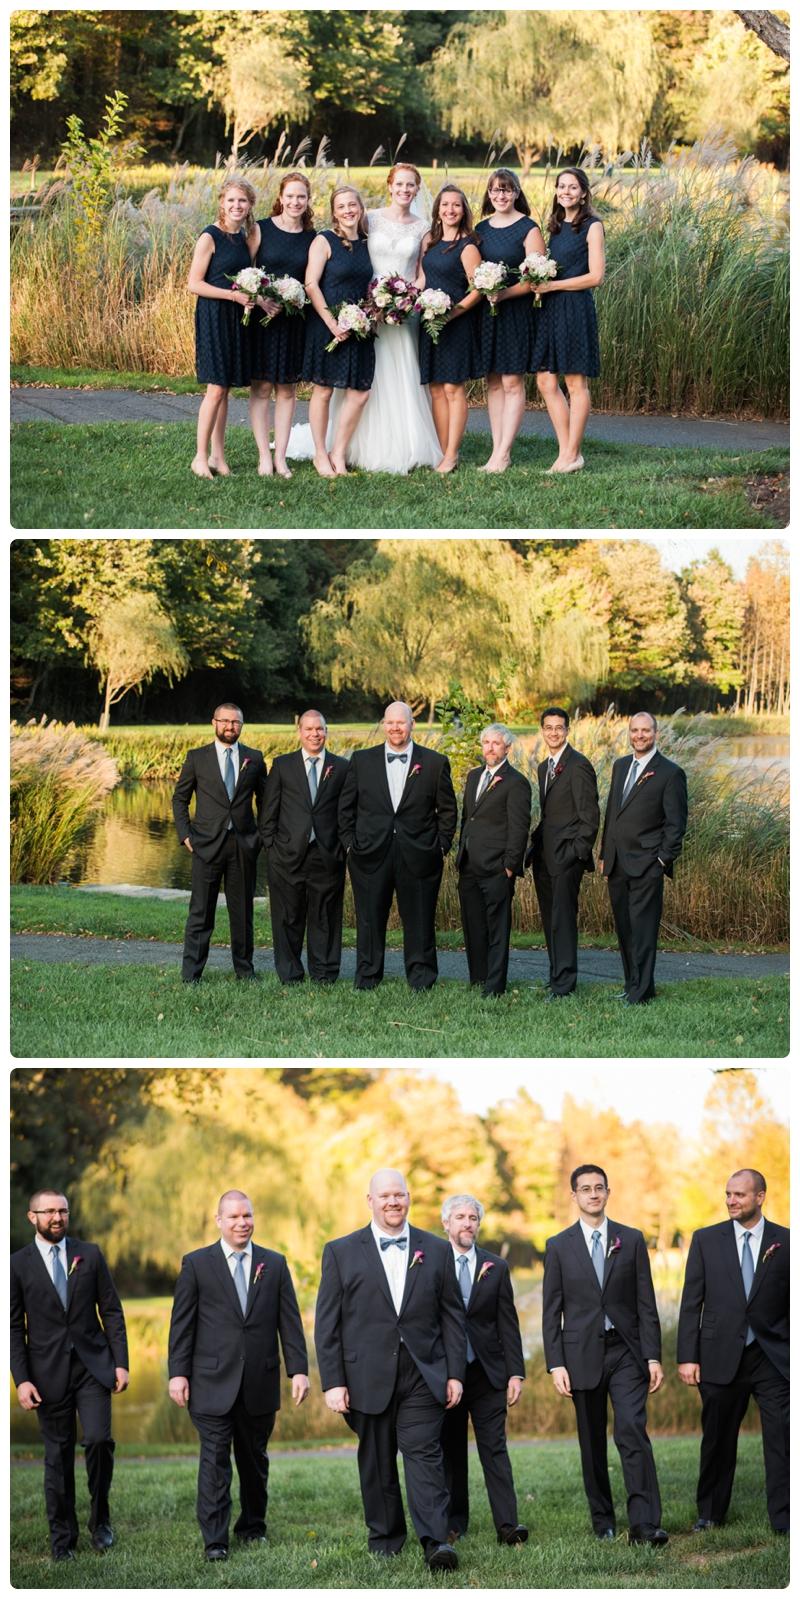 Wedding in Falls Church Virginia by Rachael Foster Photography_0021.jpg